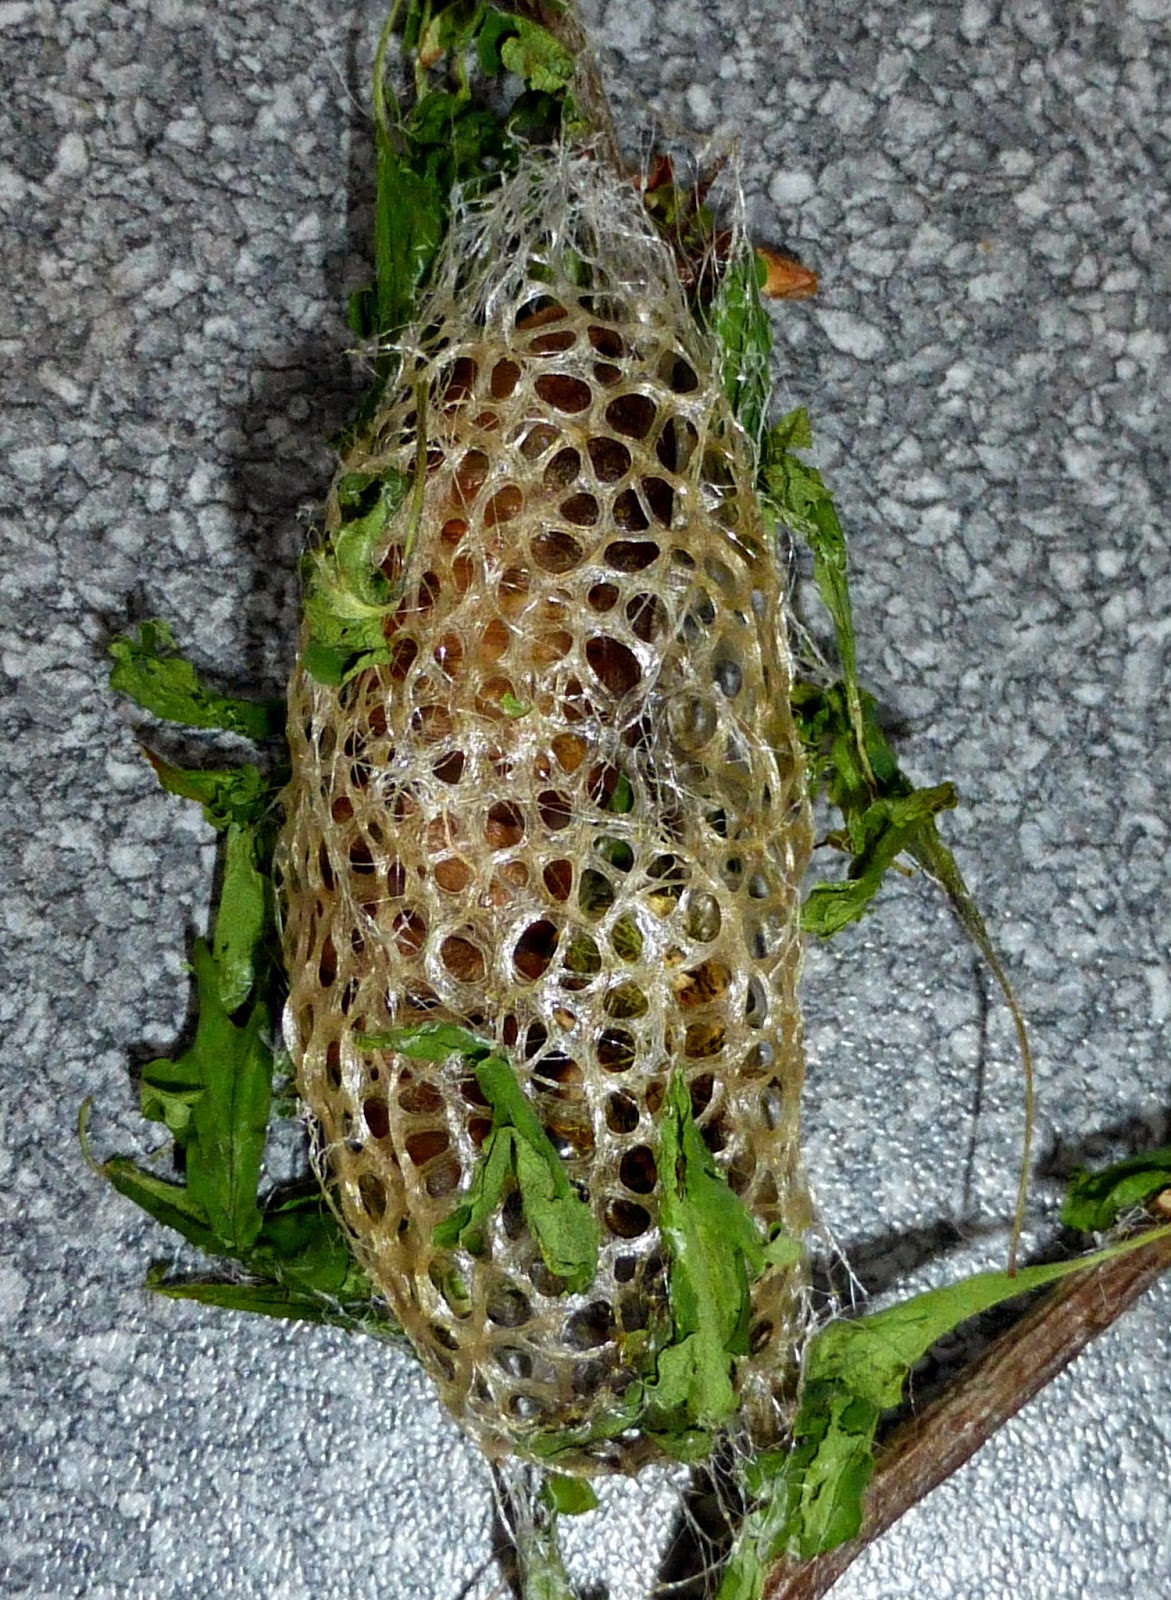 Caligula japonica cocoon